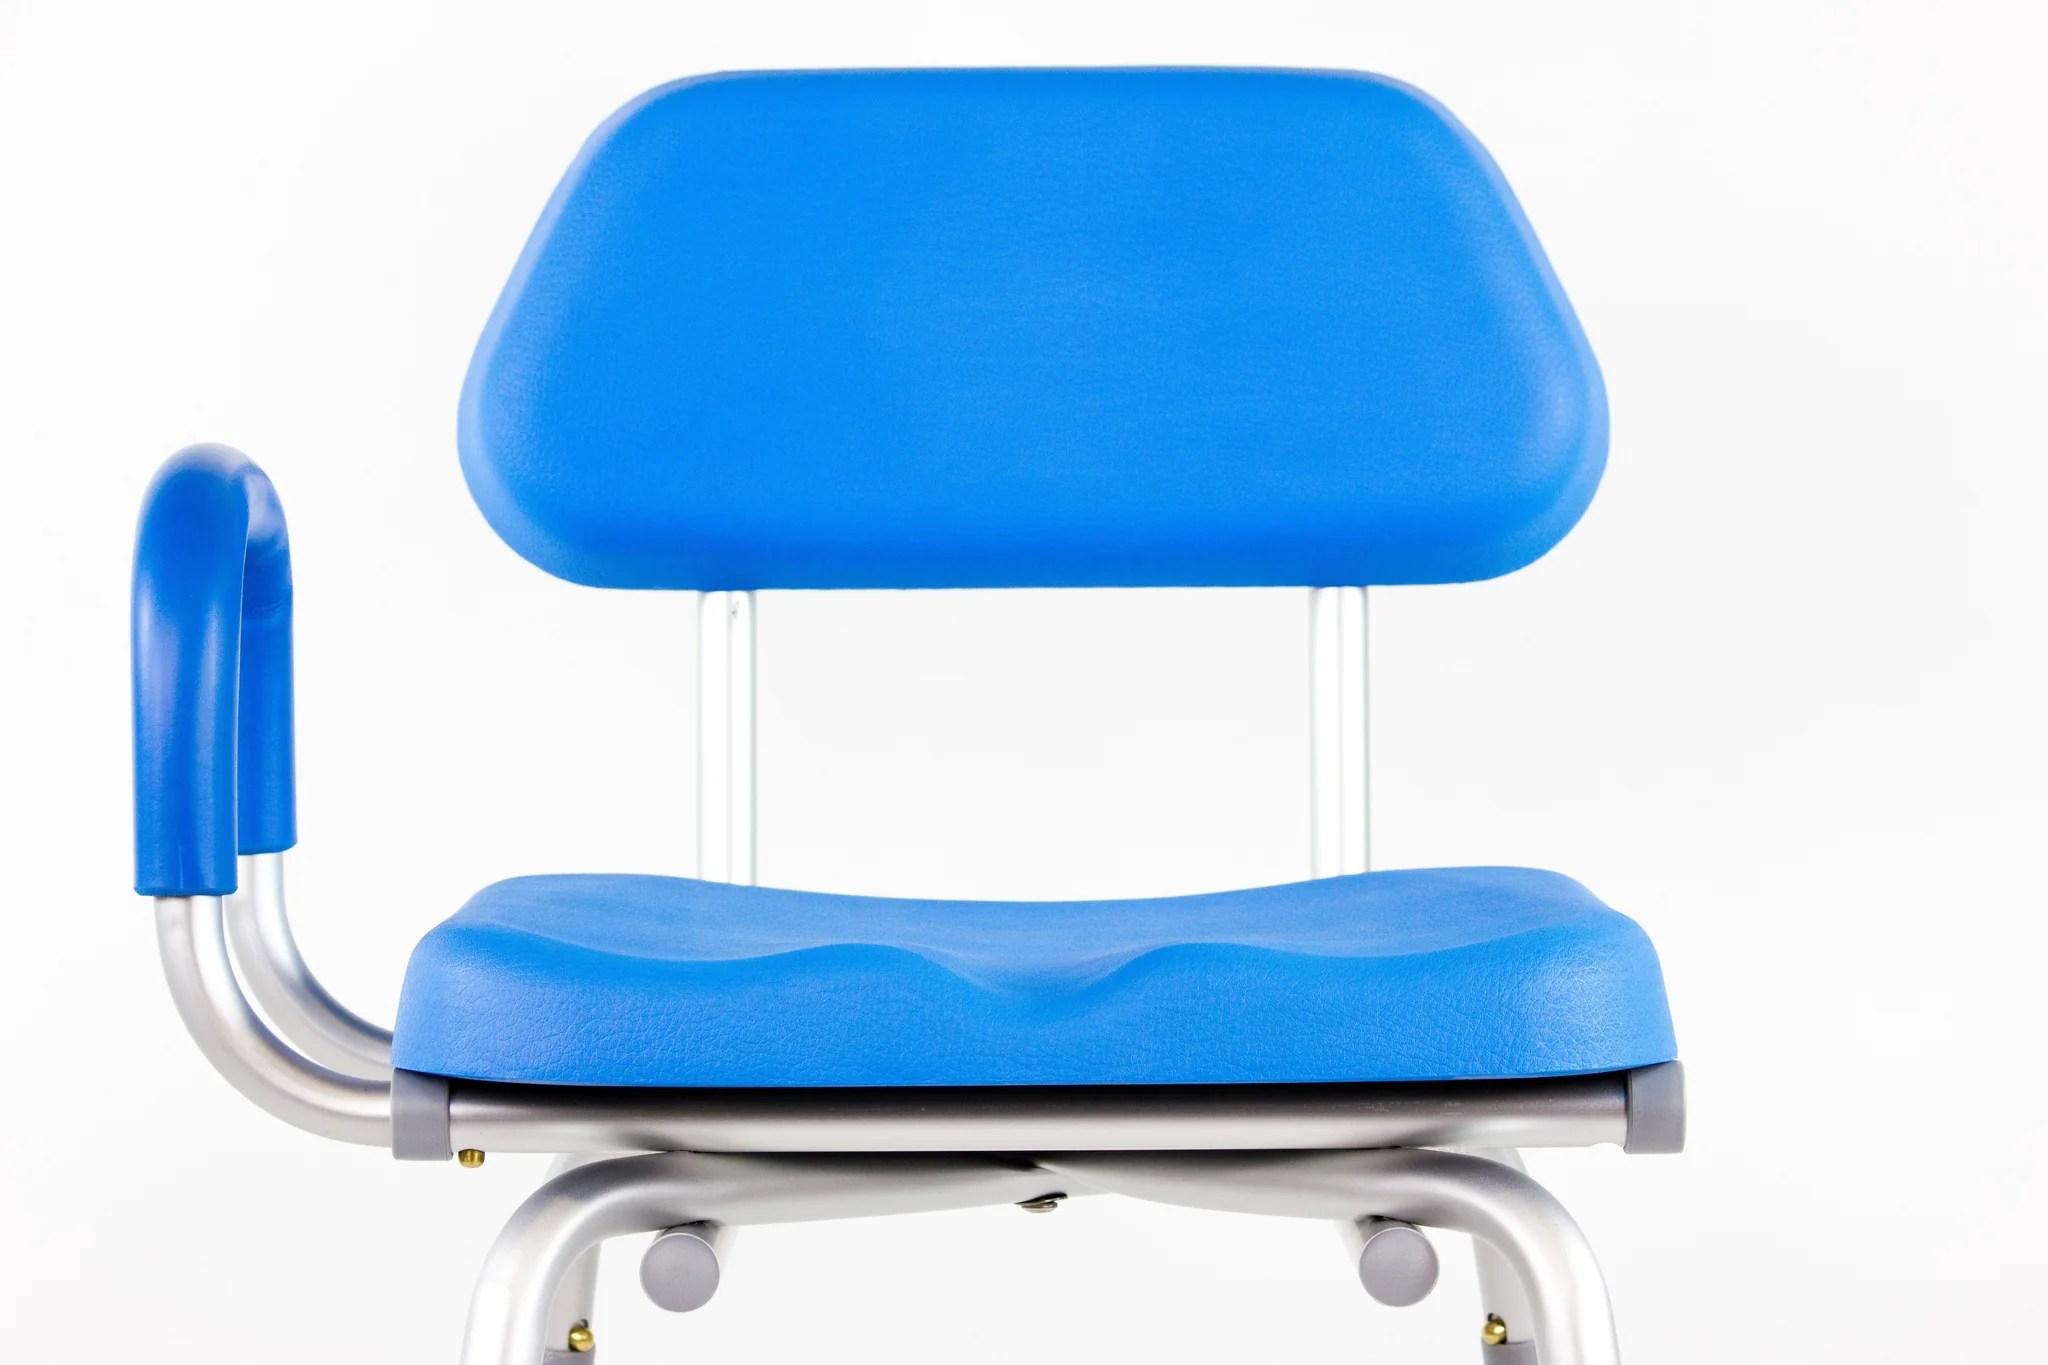 hip surgery chair the company platinum health apex tm bath shower